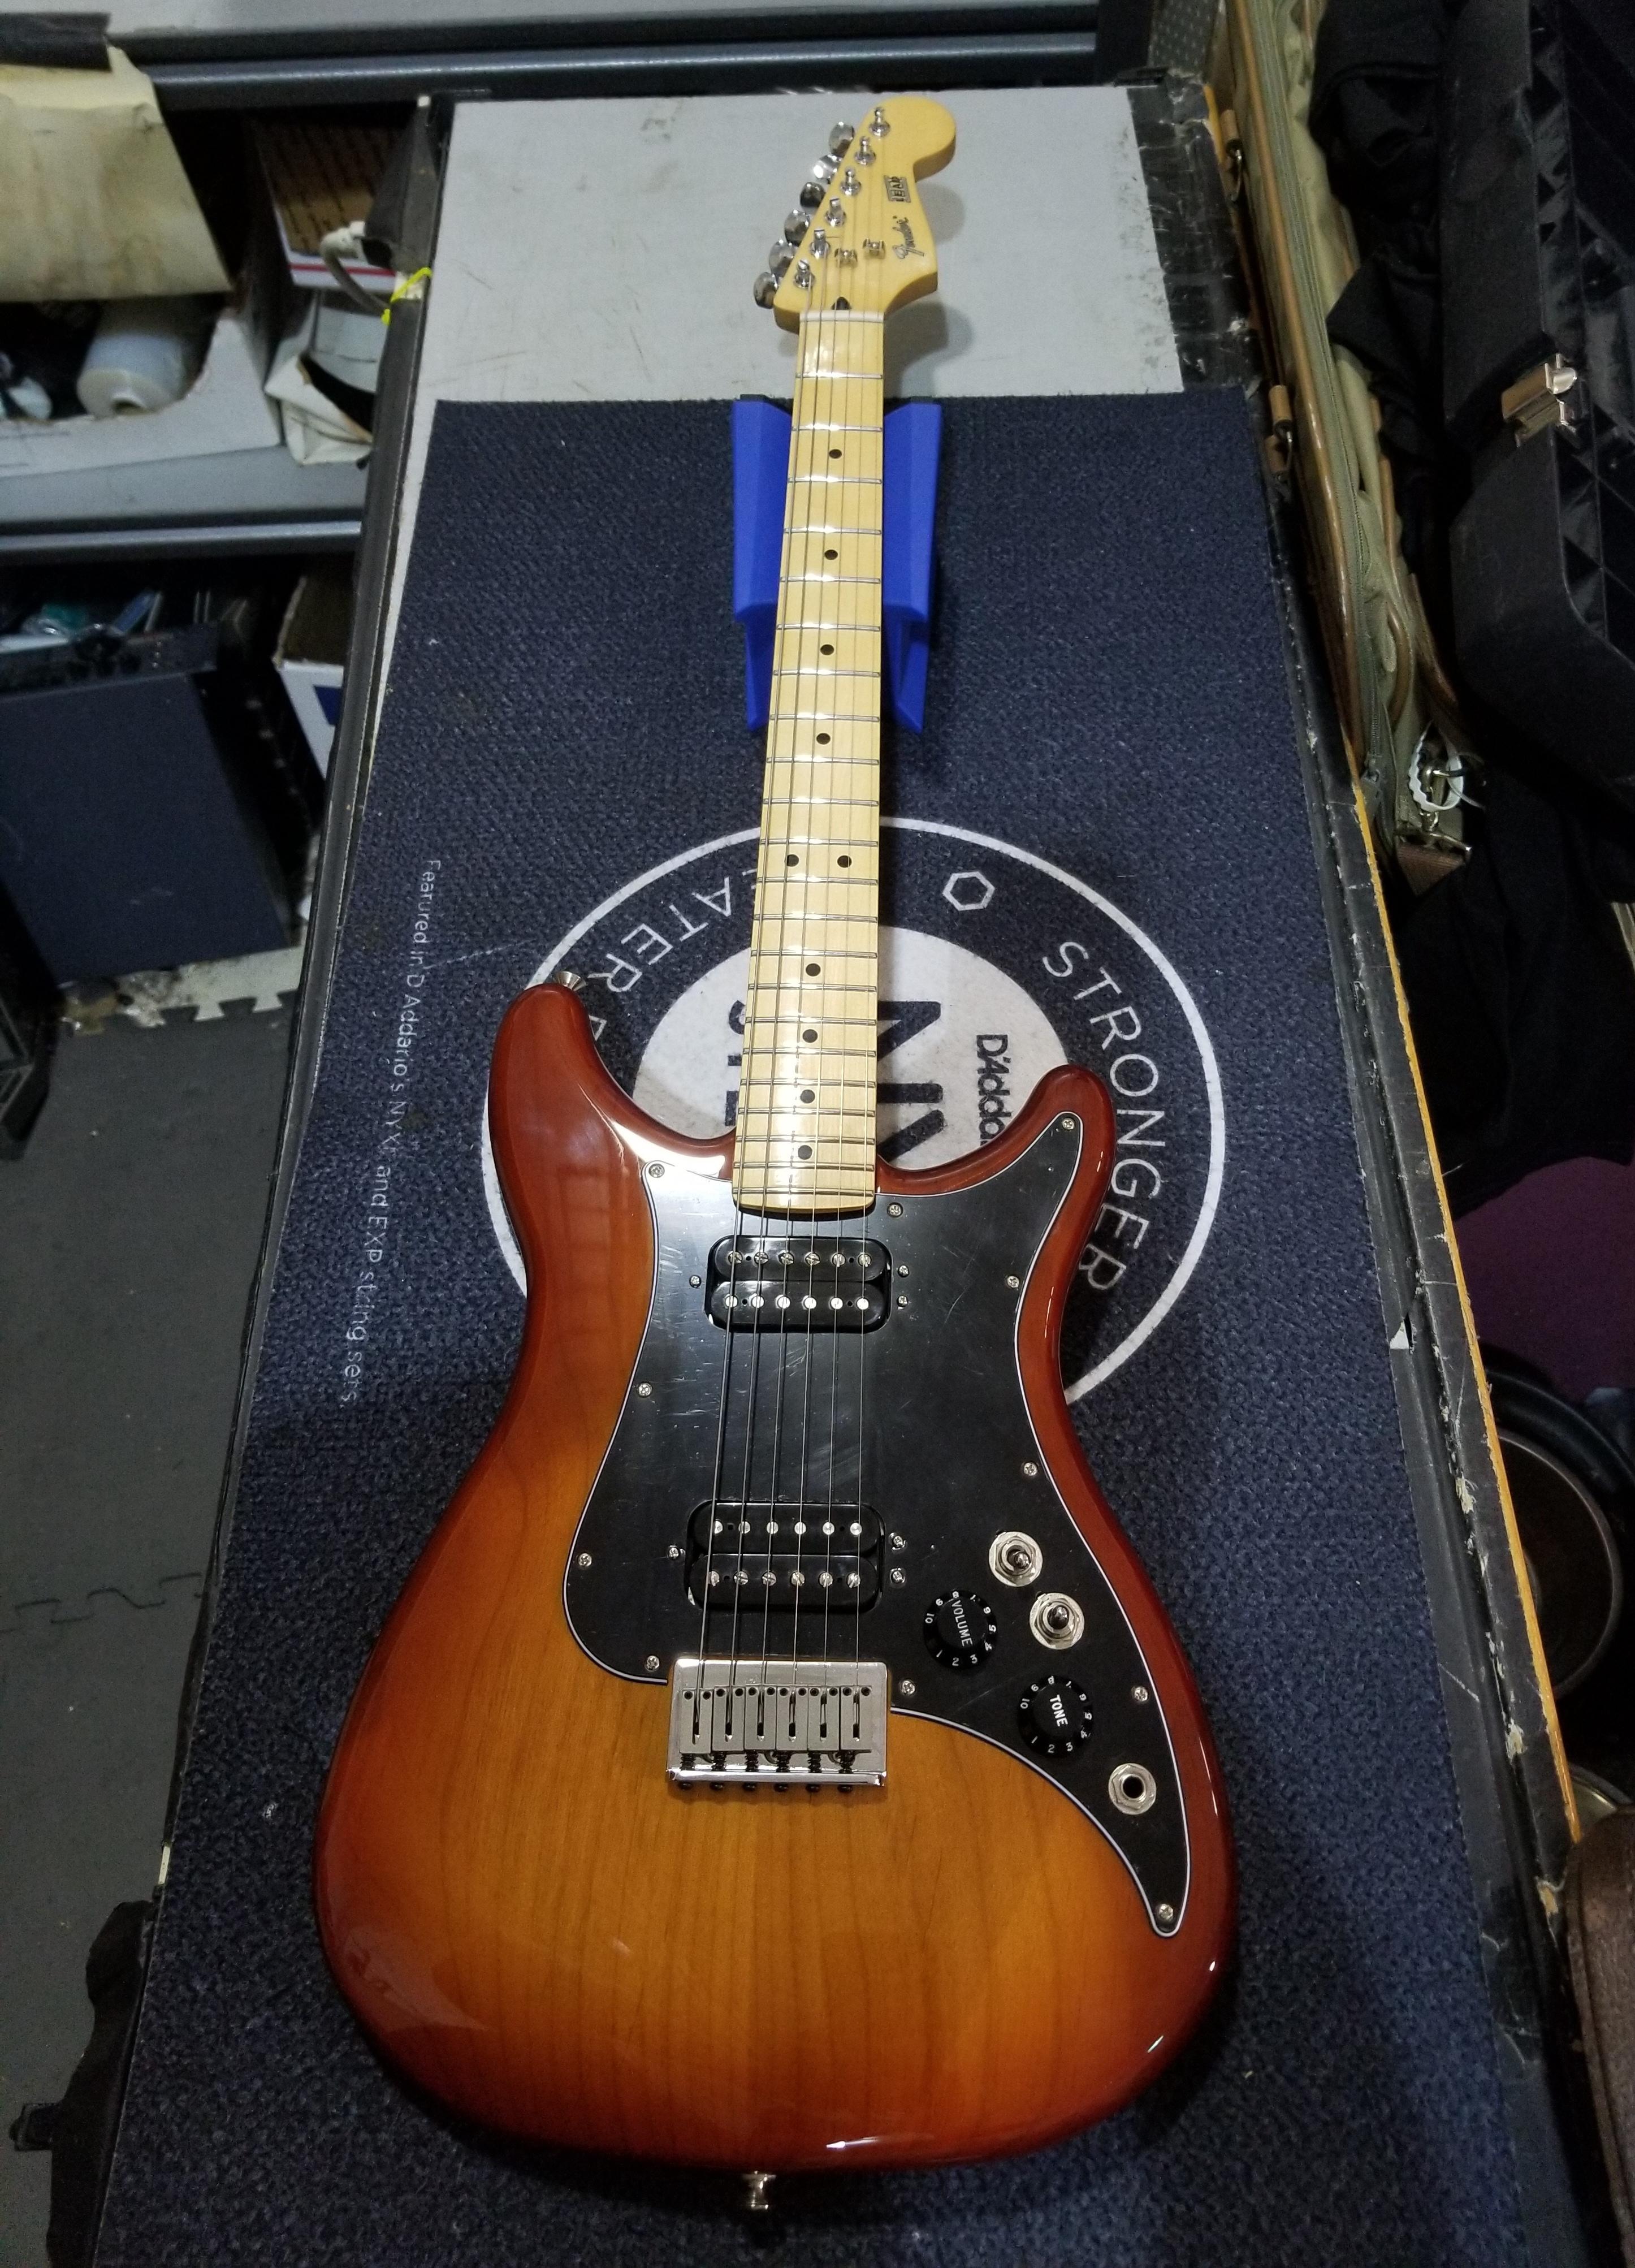 FENDER Player Lead III Electric Guitar Sienna Sunburst